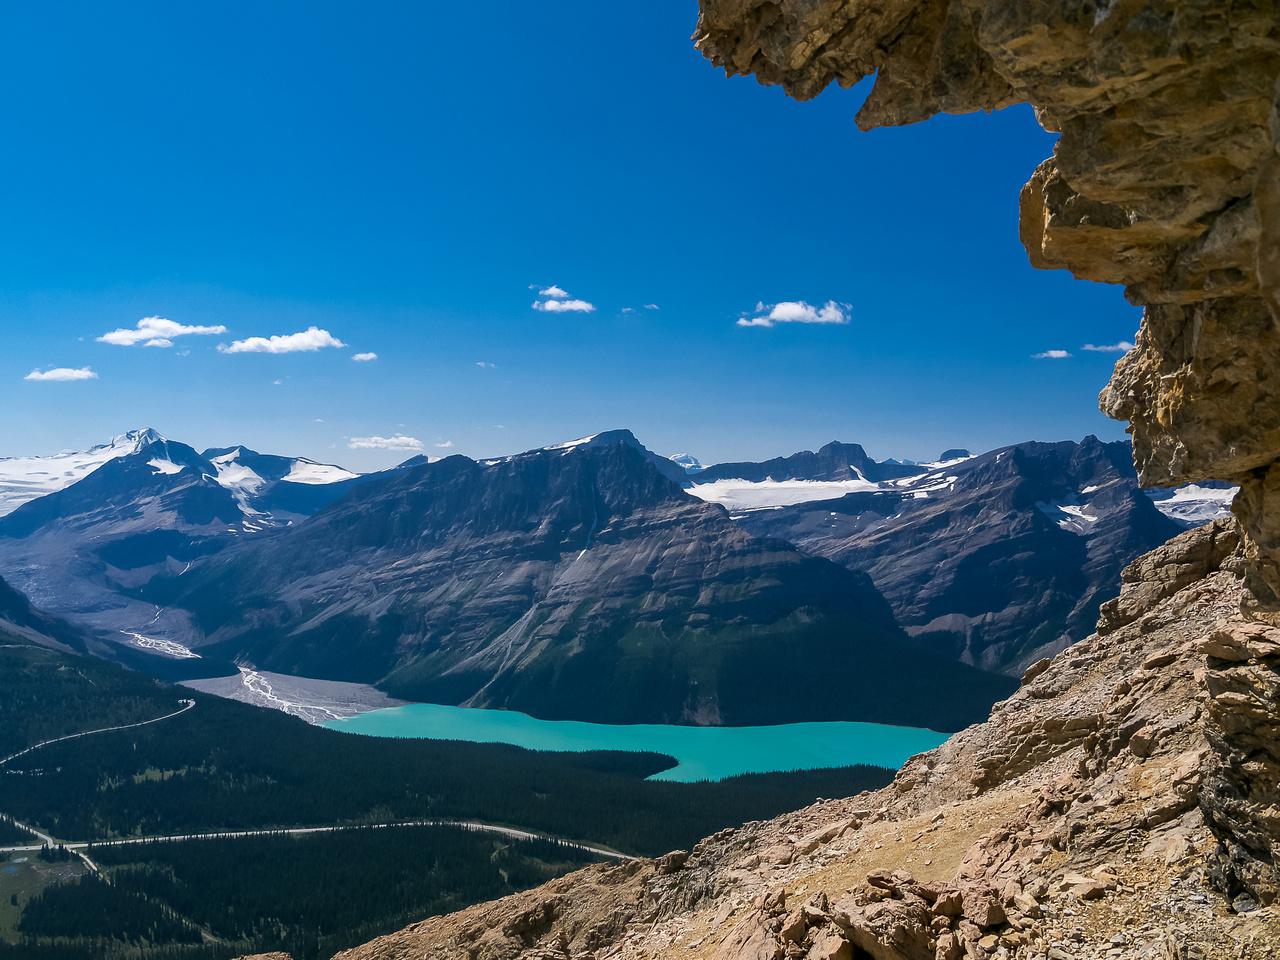 Great views of Peyto Lake as I descend.